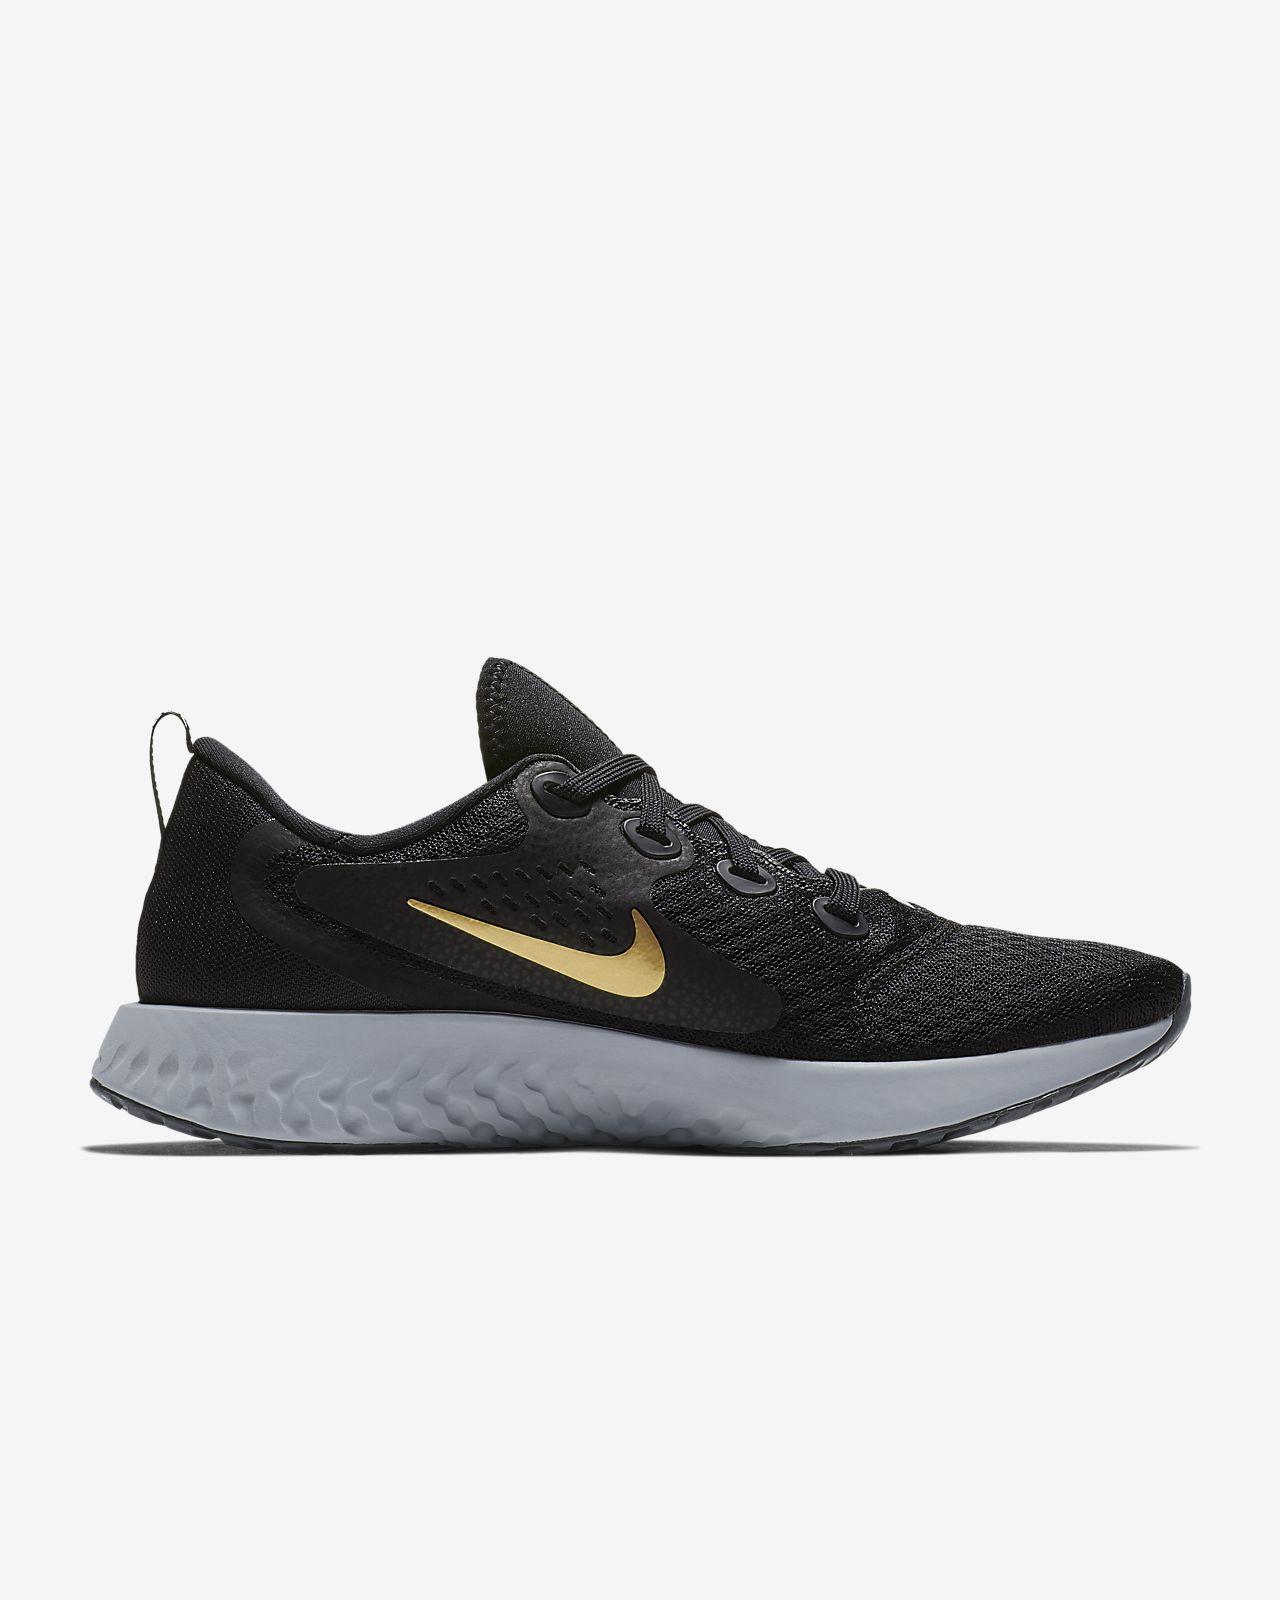 9 Reasons toNOT to Buy Nike Legend React (Oct 2019)  RunRepeat